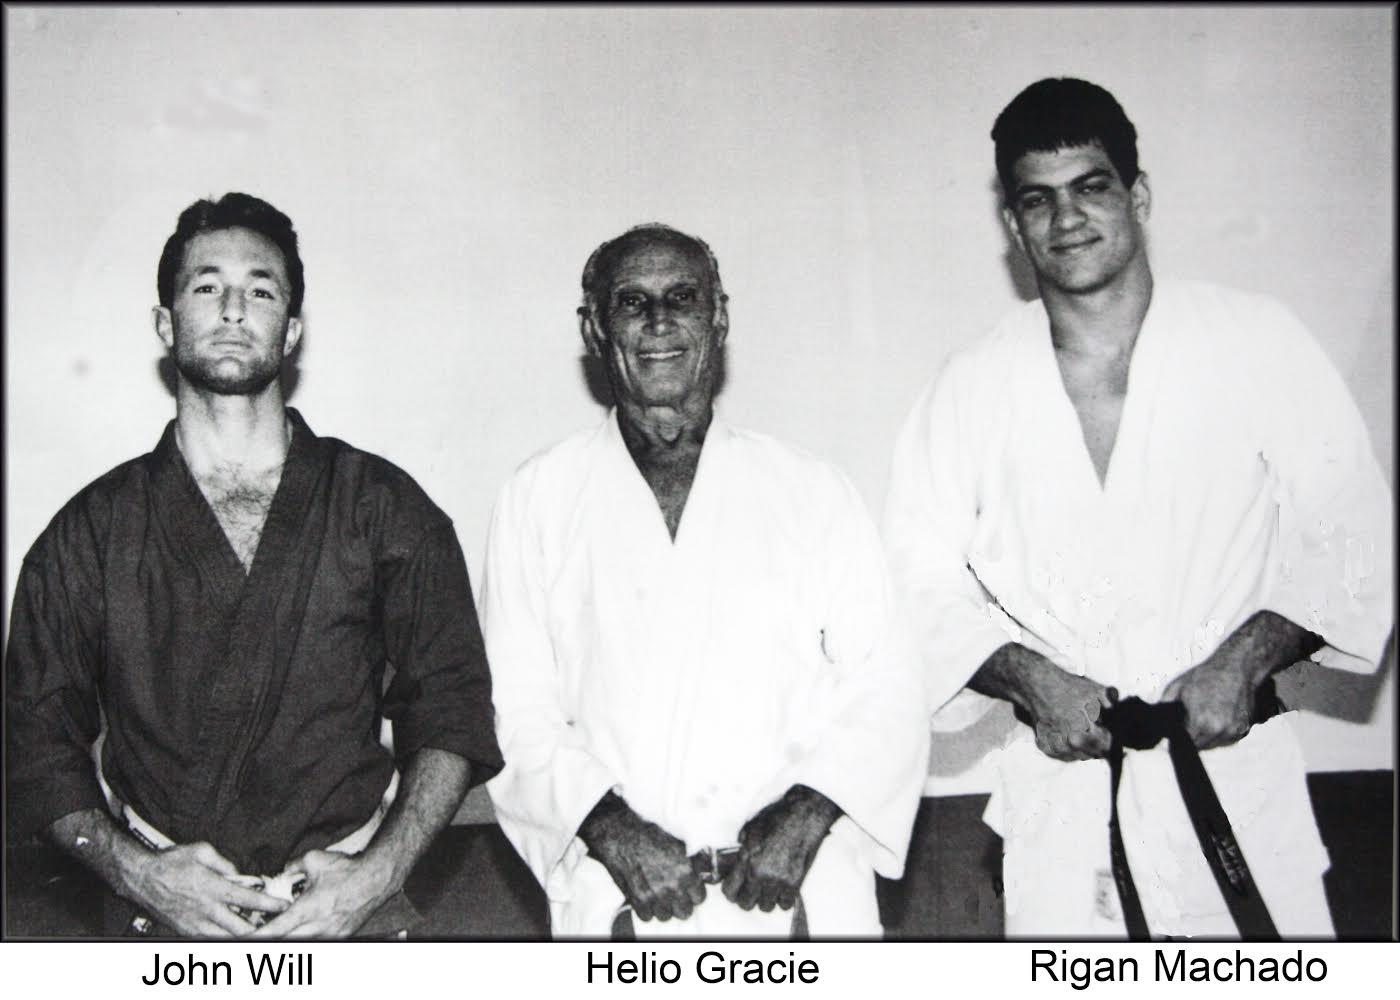 Artemis BJJ Brazilian Jiu Jitsu Bristol interview with John Will, pictured with Helio and Rigan